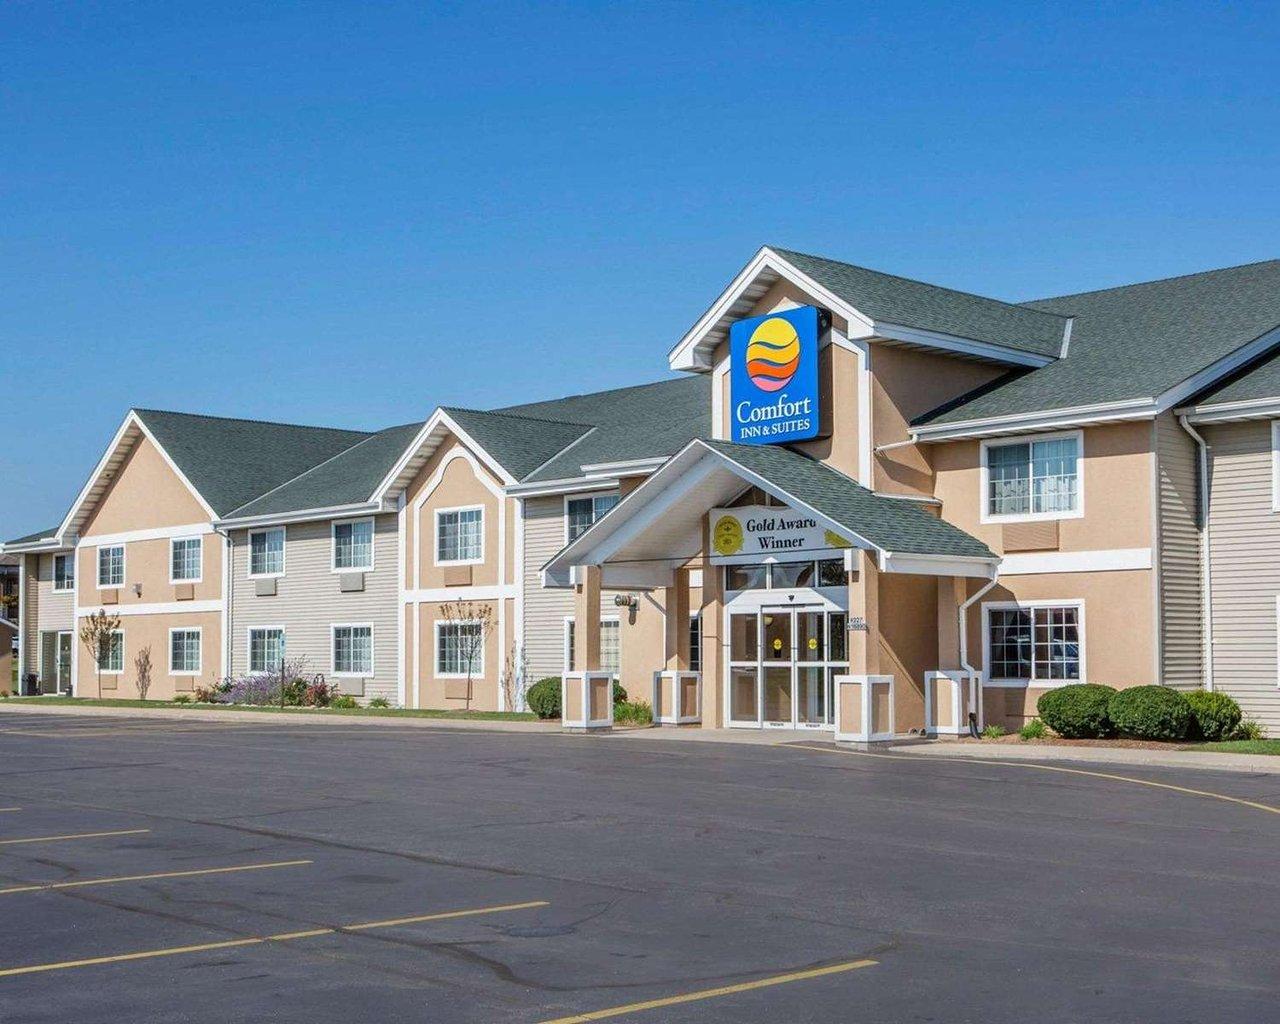 comfort inn suites 84 1 2 1 updated 2019 prices hotel rh tripadvisor com